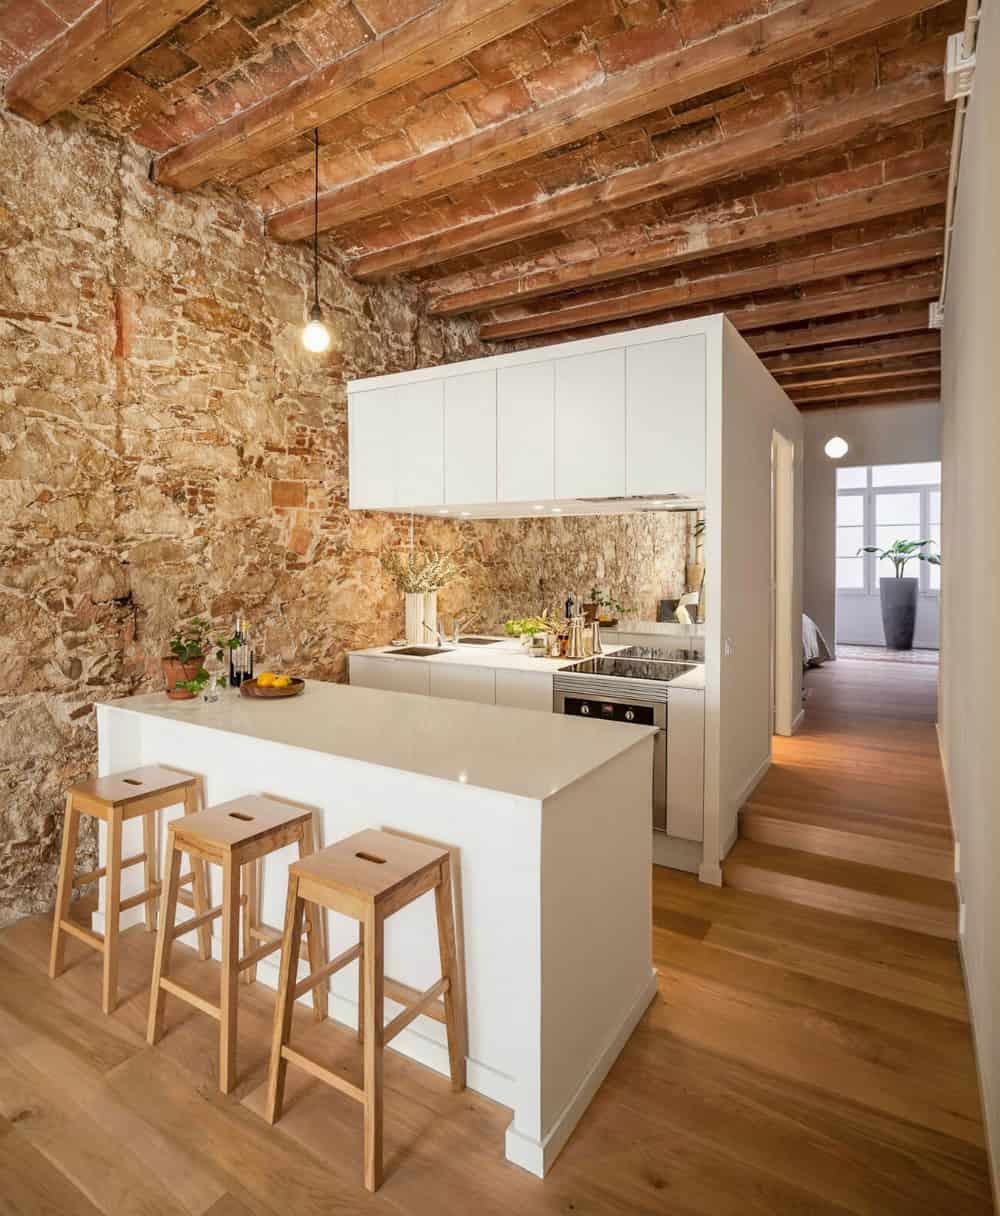 Les Corts apartment kitchen